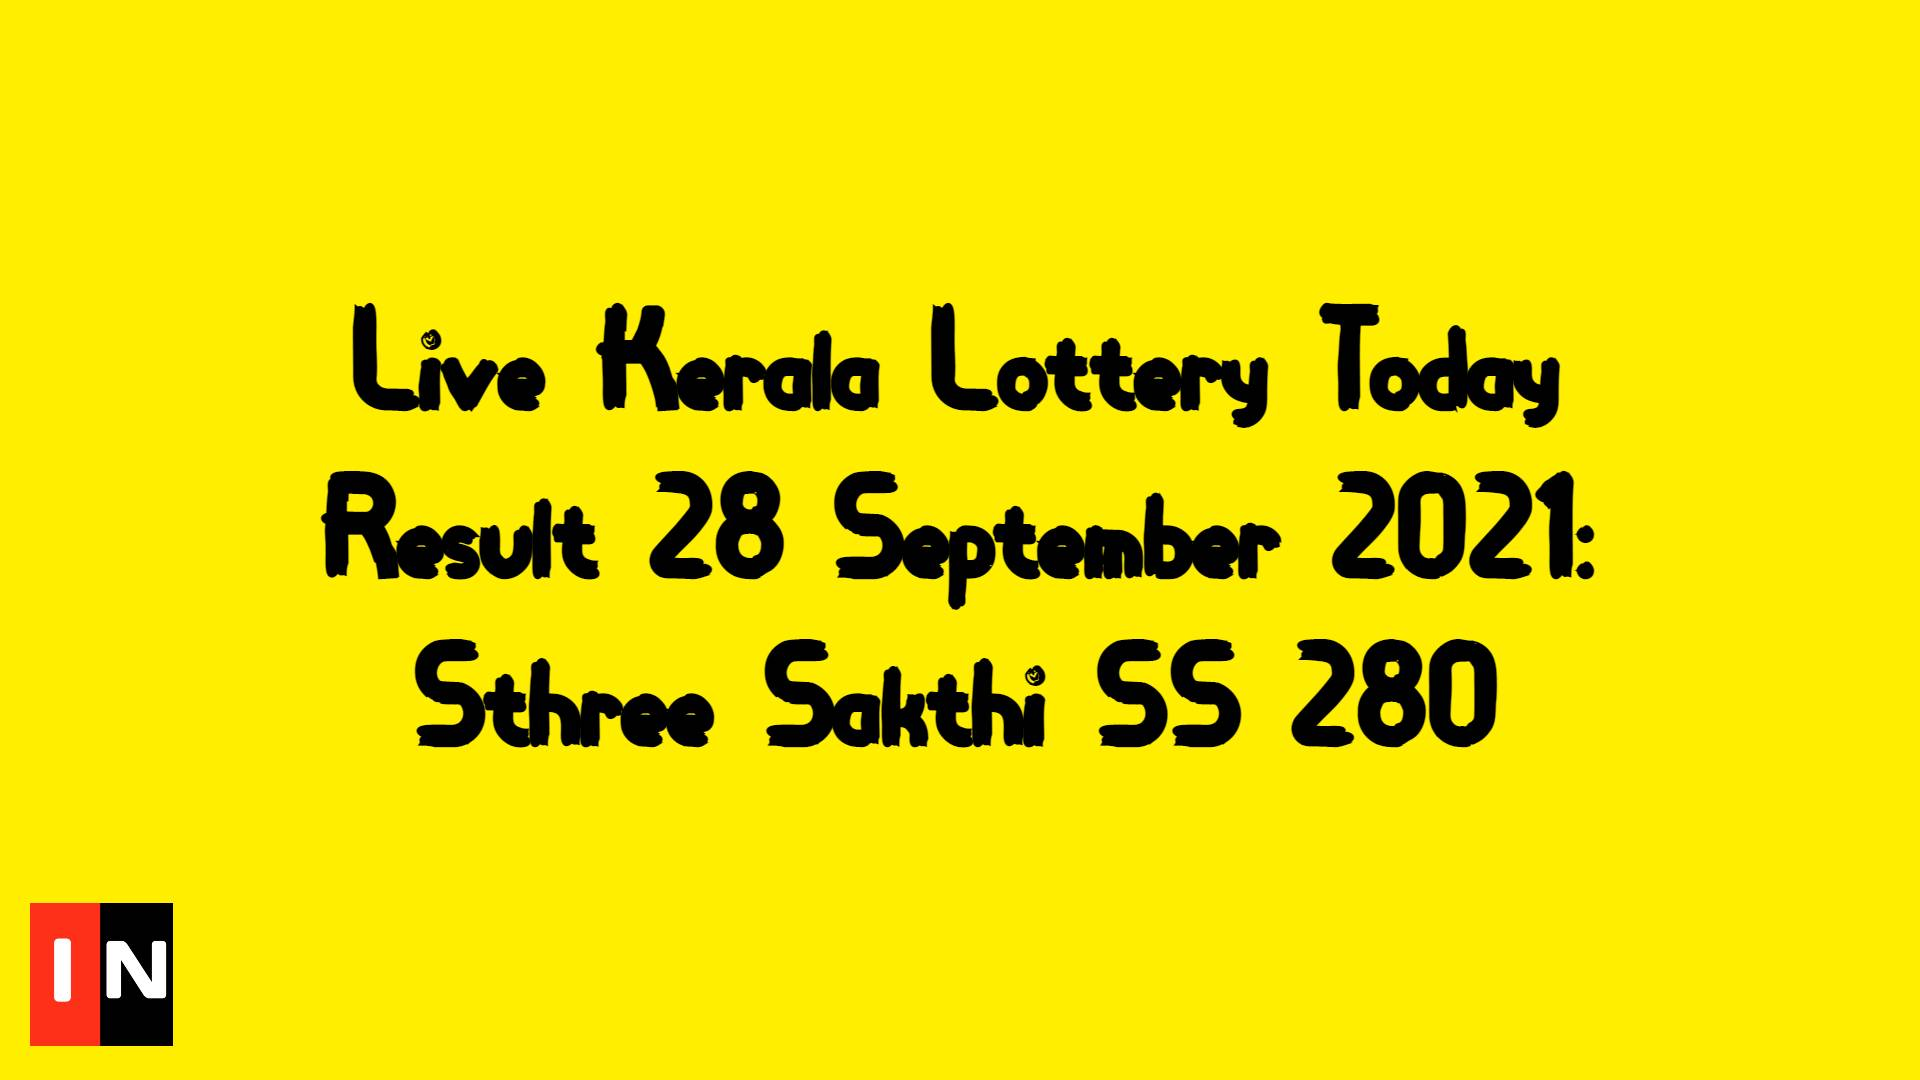 Live Kerala Lottery Today Result 28 September 2021: Sthree Sakthi SS 280